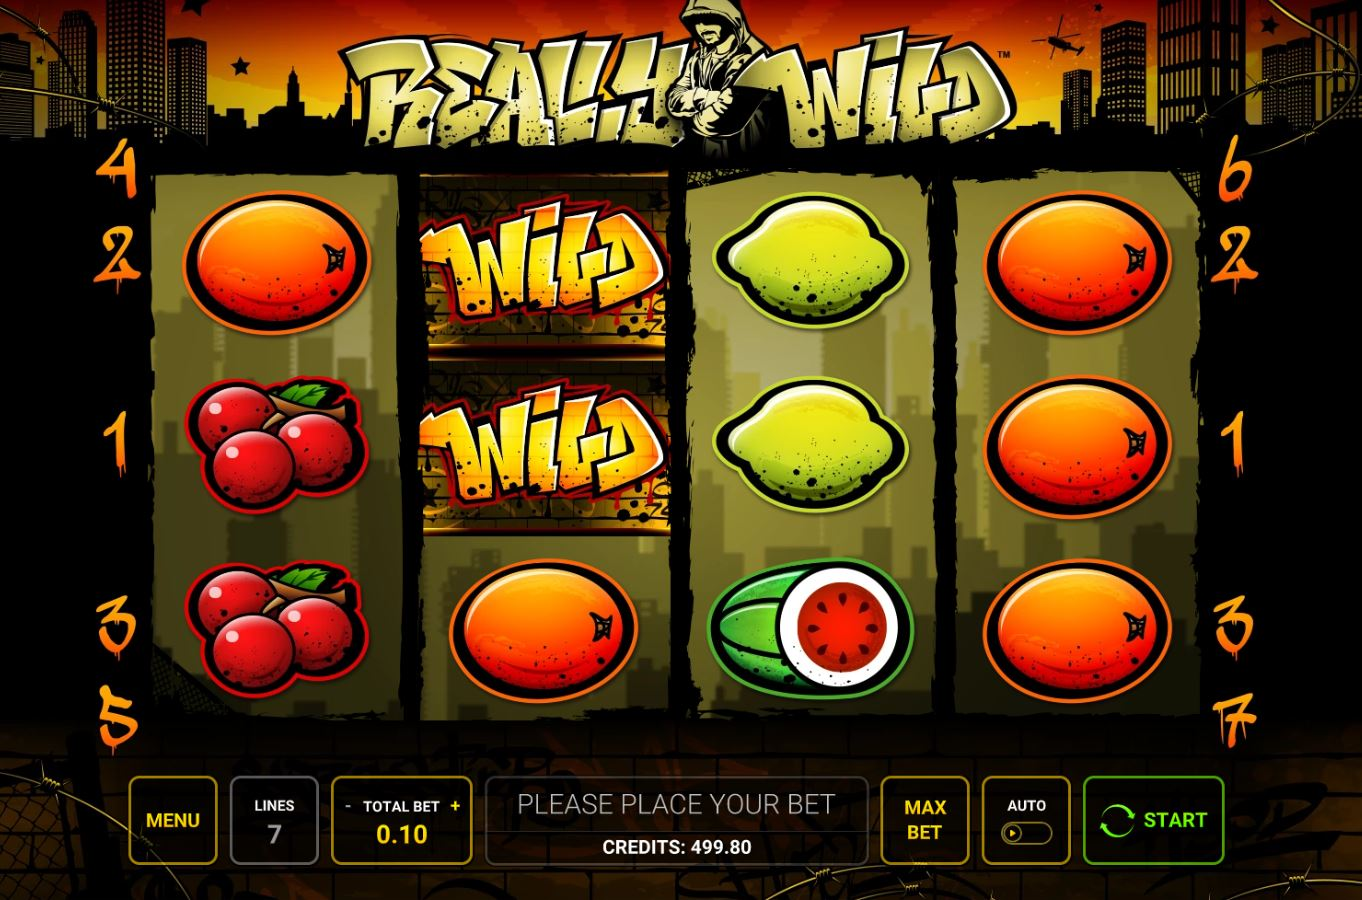 Slot Game Reely Wild